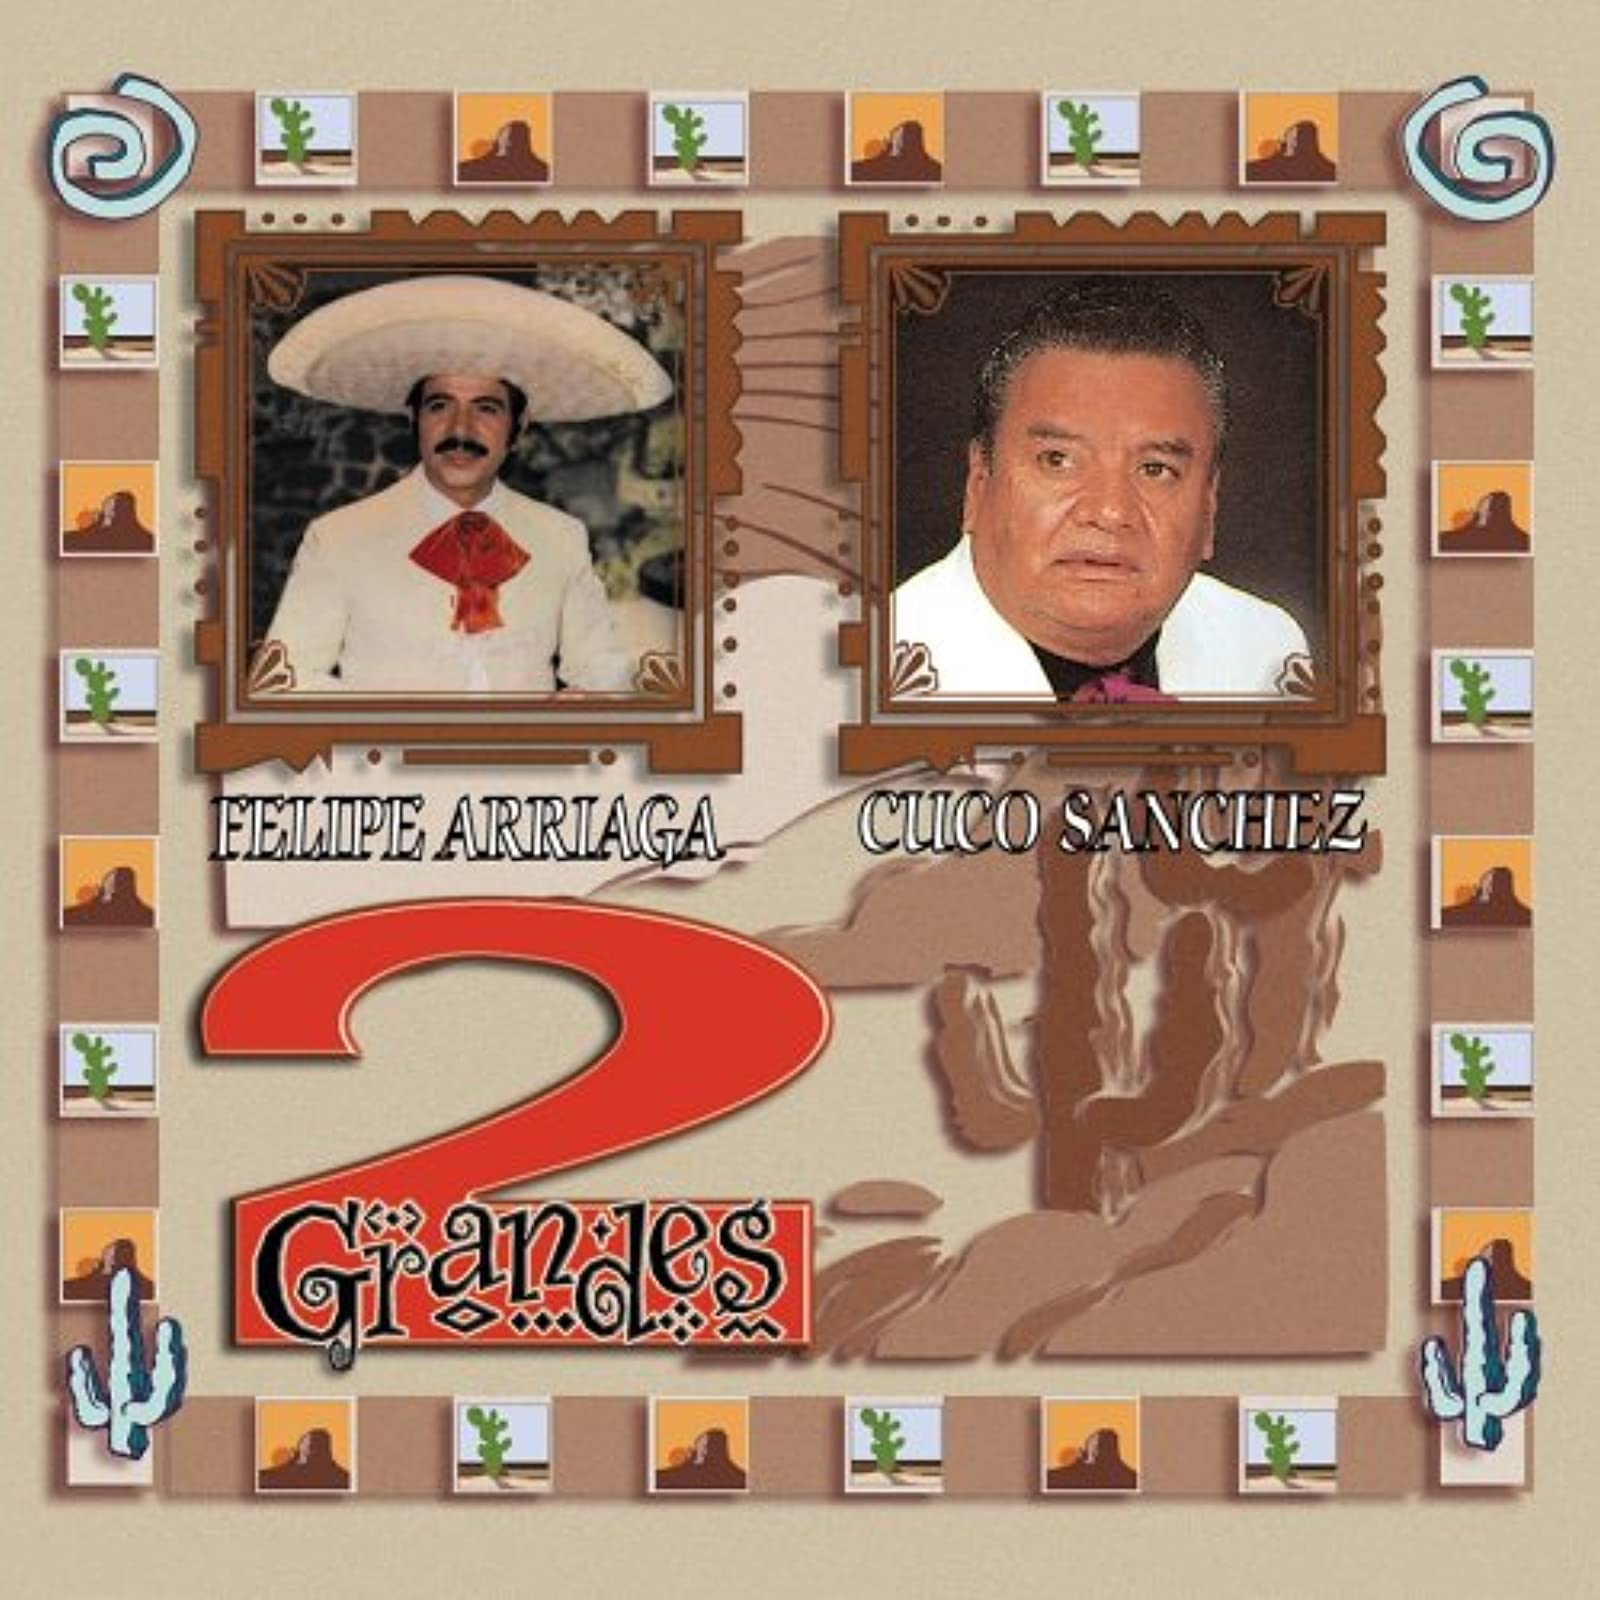 2 Grandes By Arriaga Felipe Sanchez Cuco Blues Album World Music 2000 On Audio C